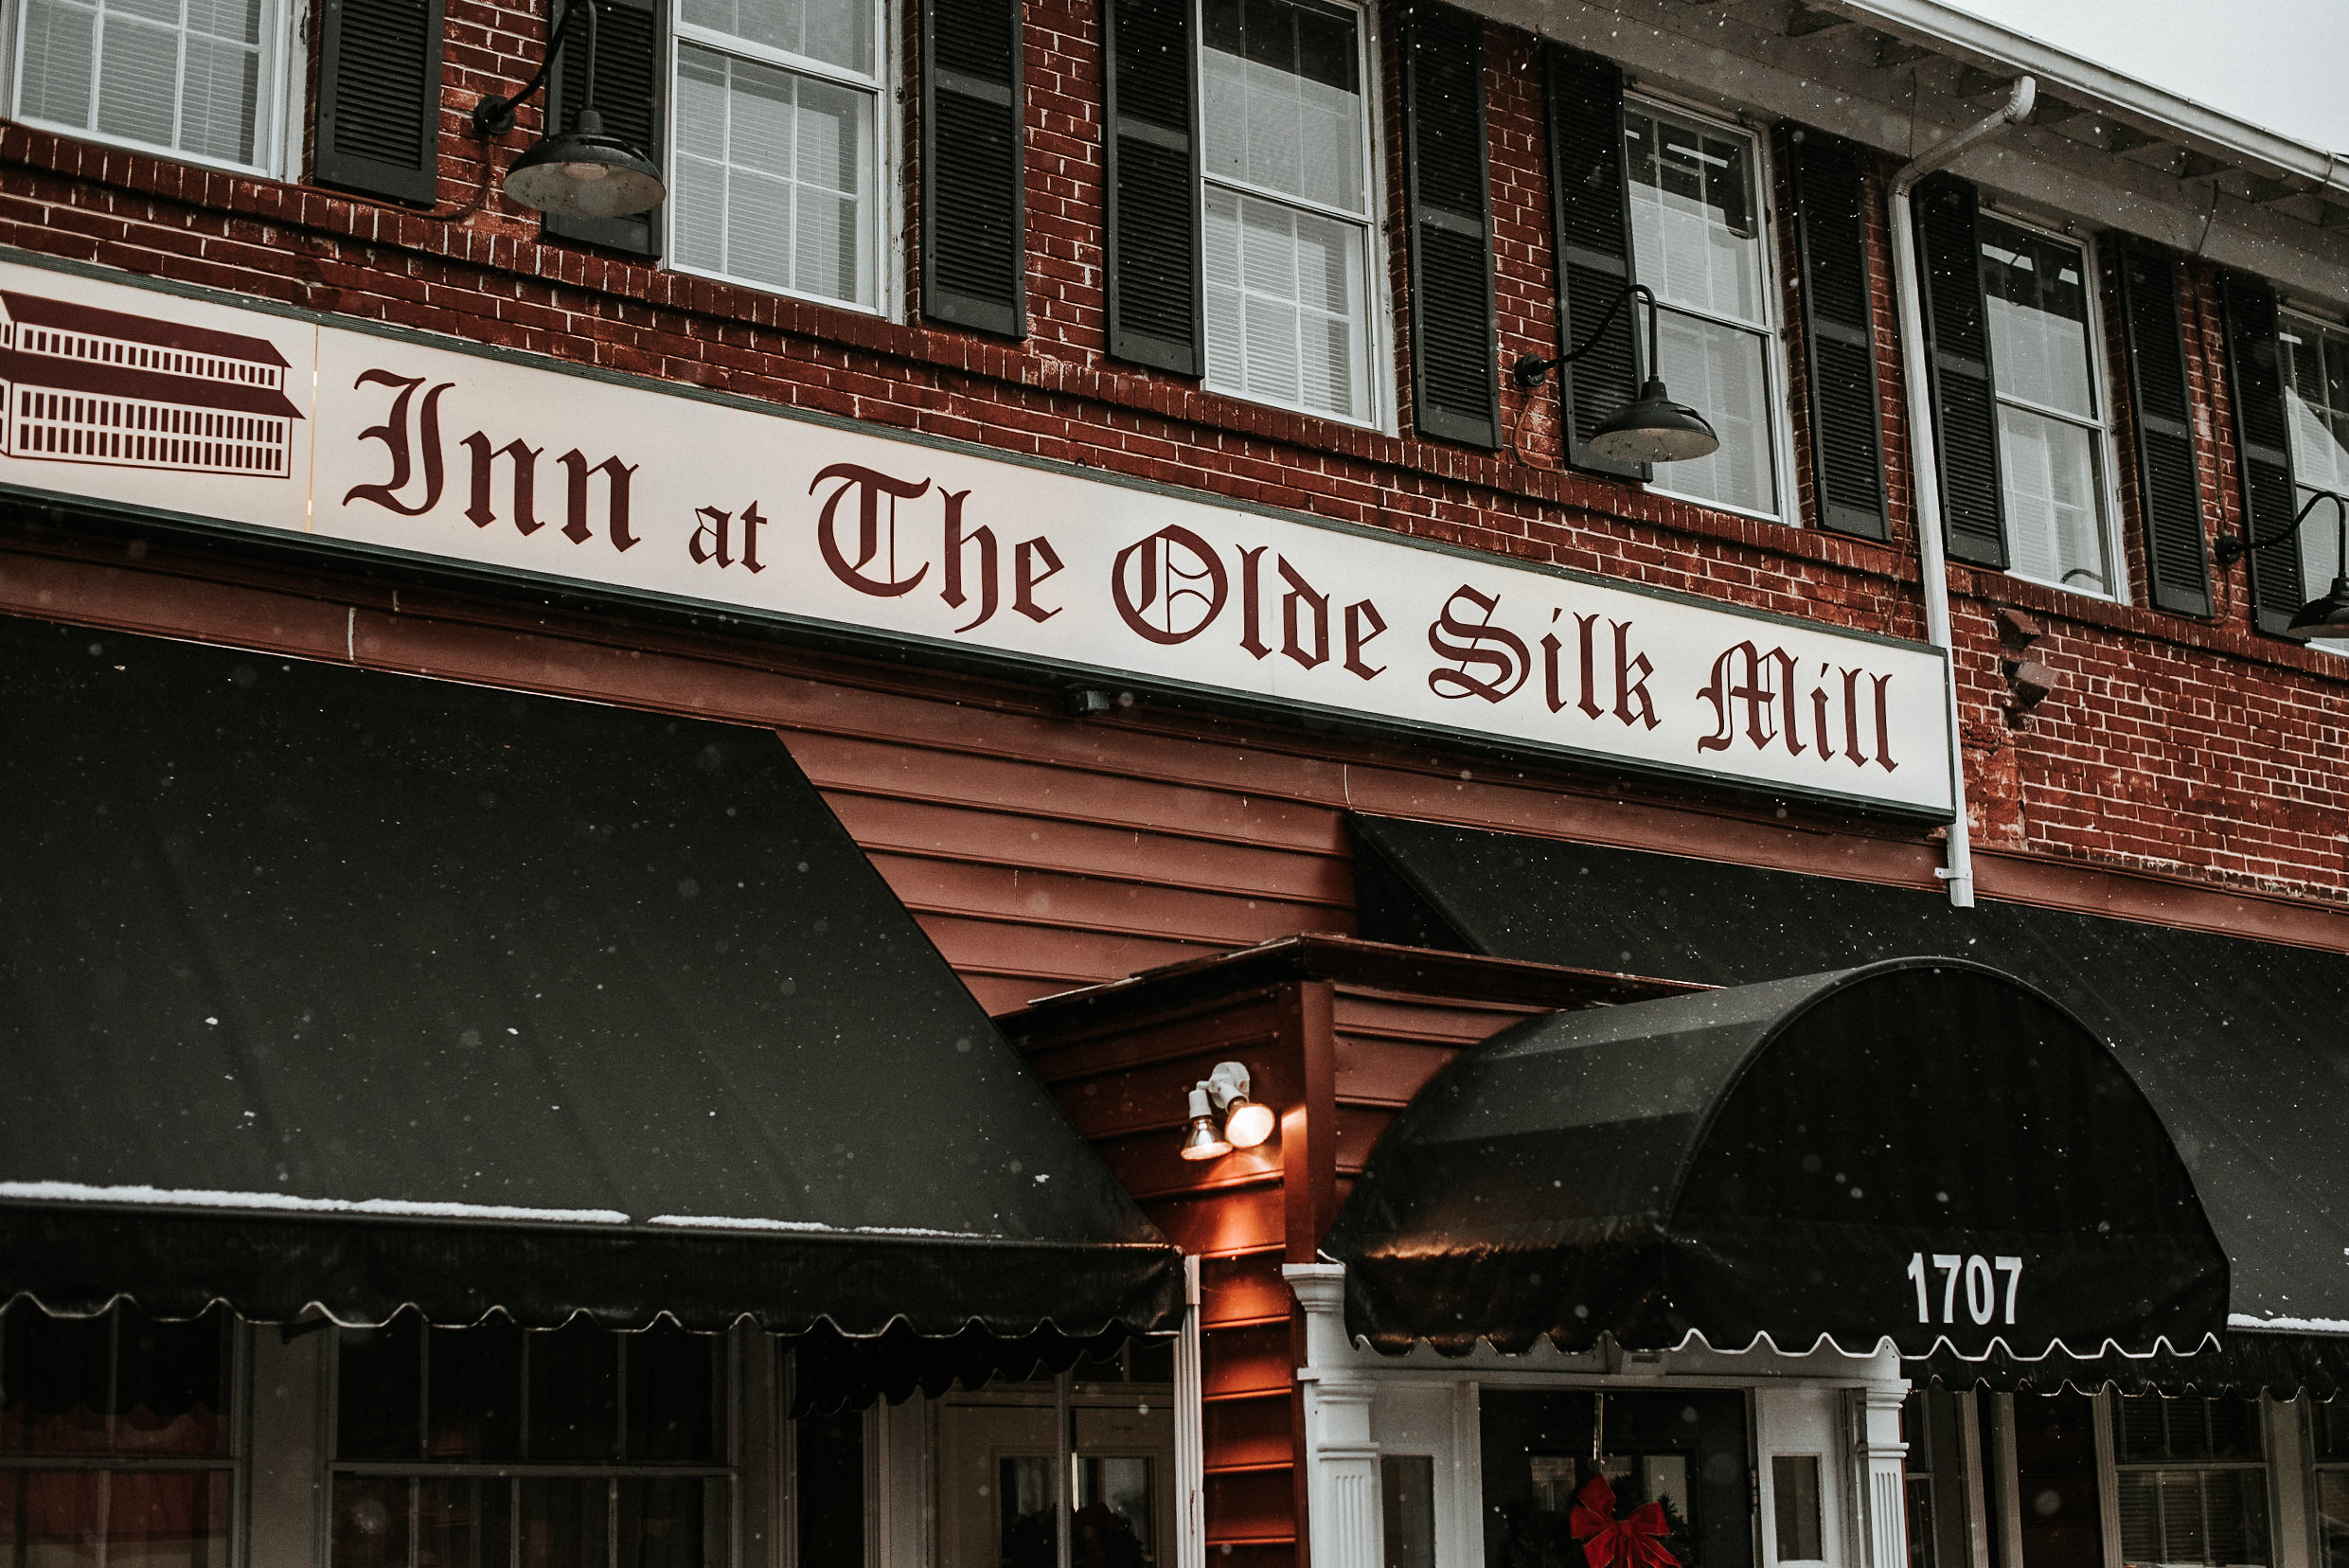 Inn at The Olde Silk Mill